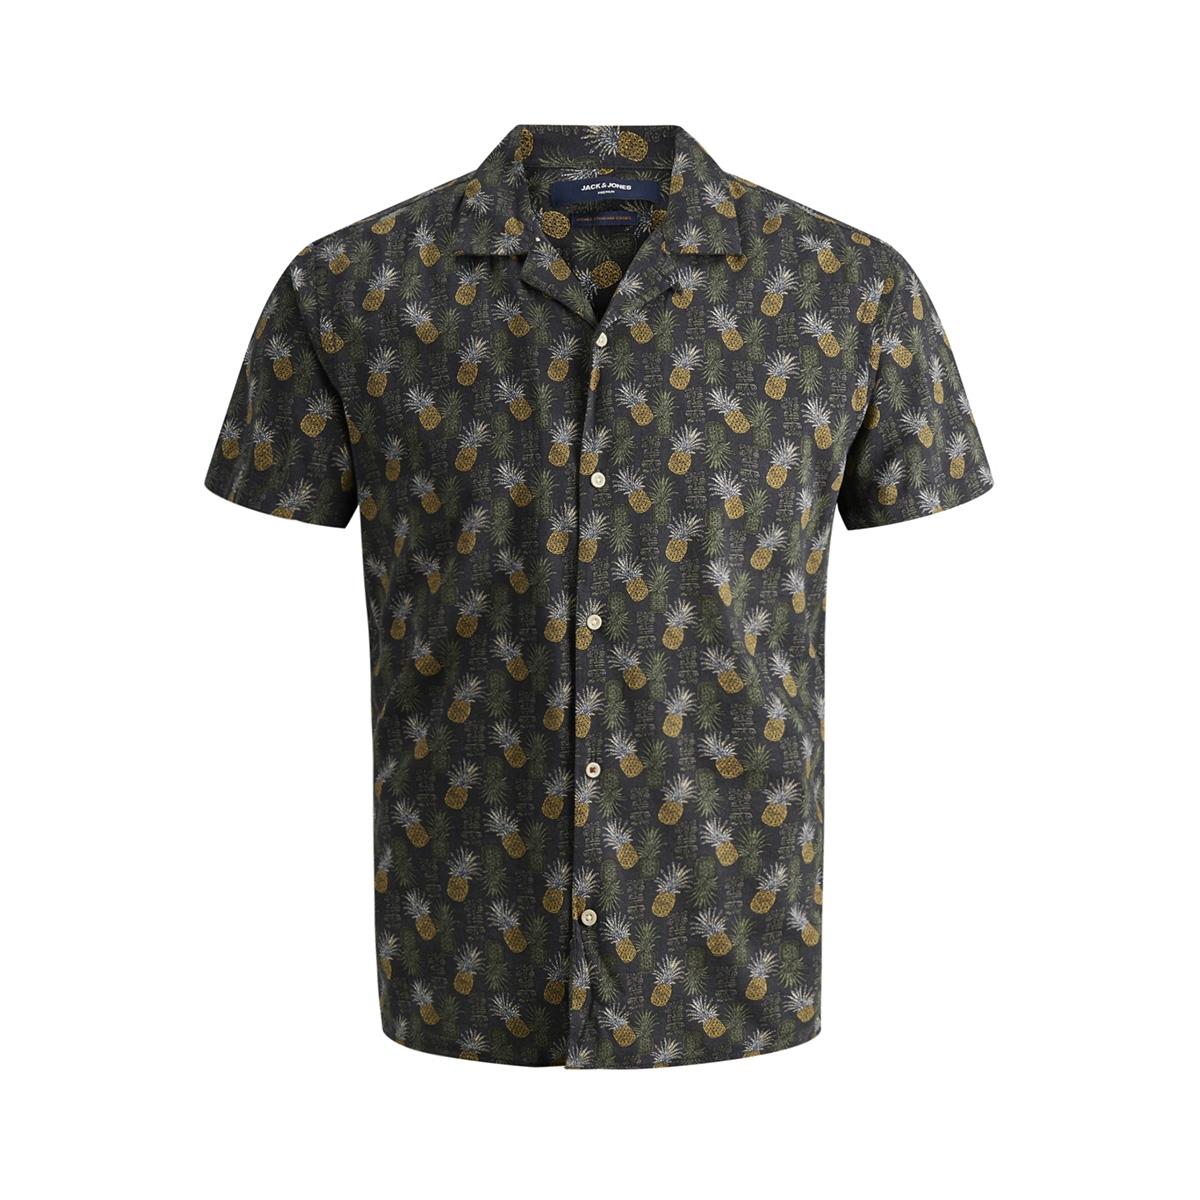 jprjayden resort shirt s/s 12151926 jack & jones overhemd caviar